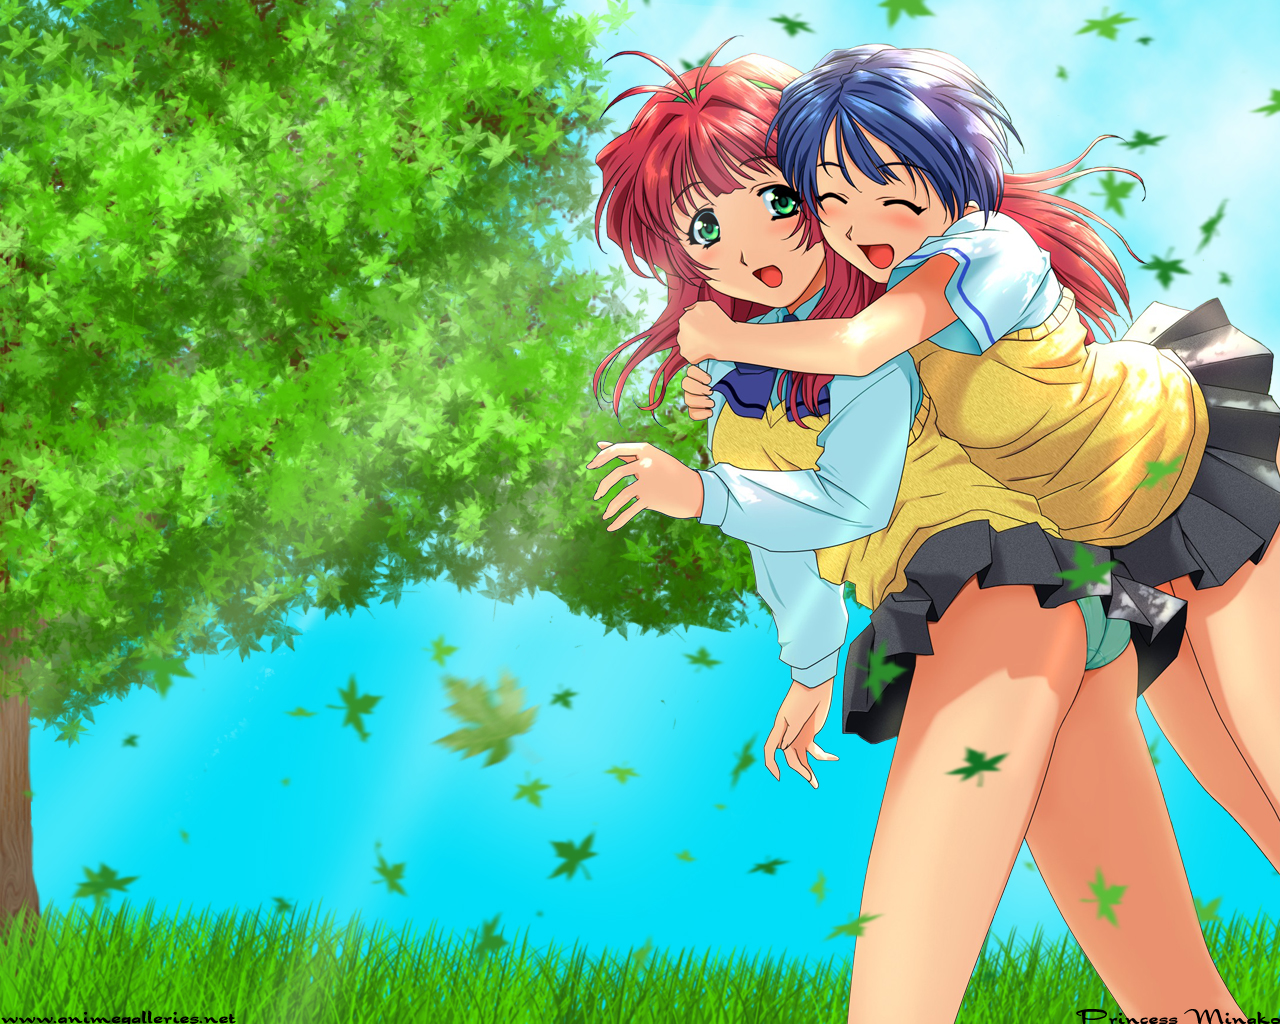 Miscellaneous Anime Wallpaper # 33